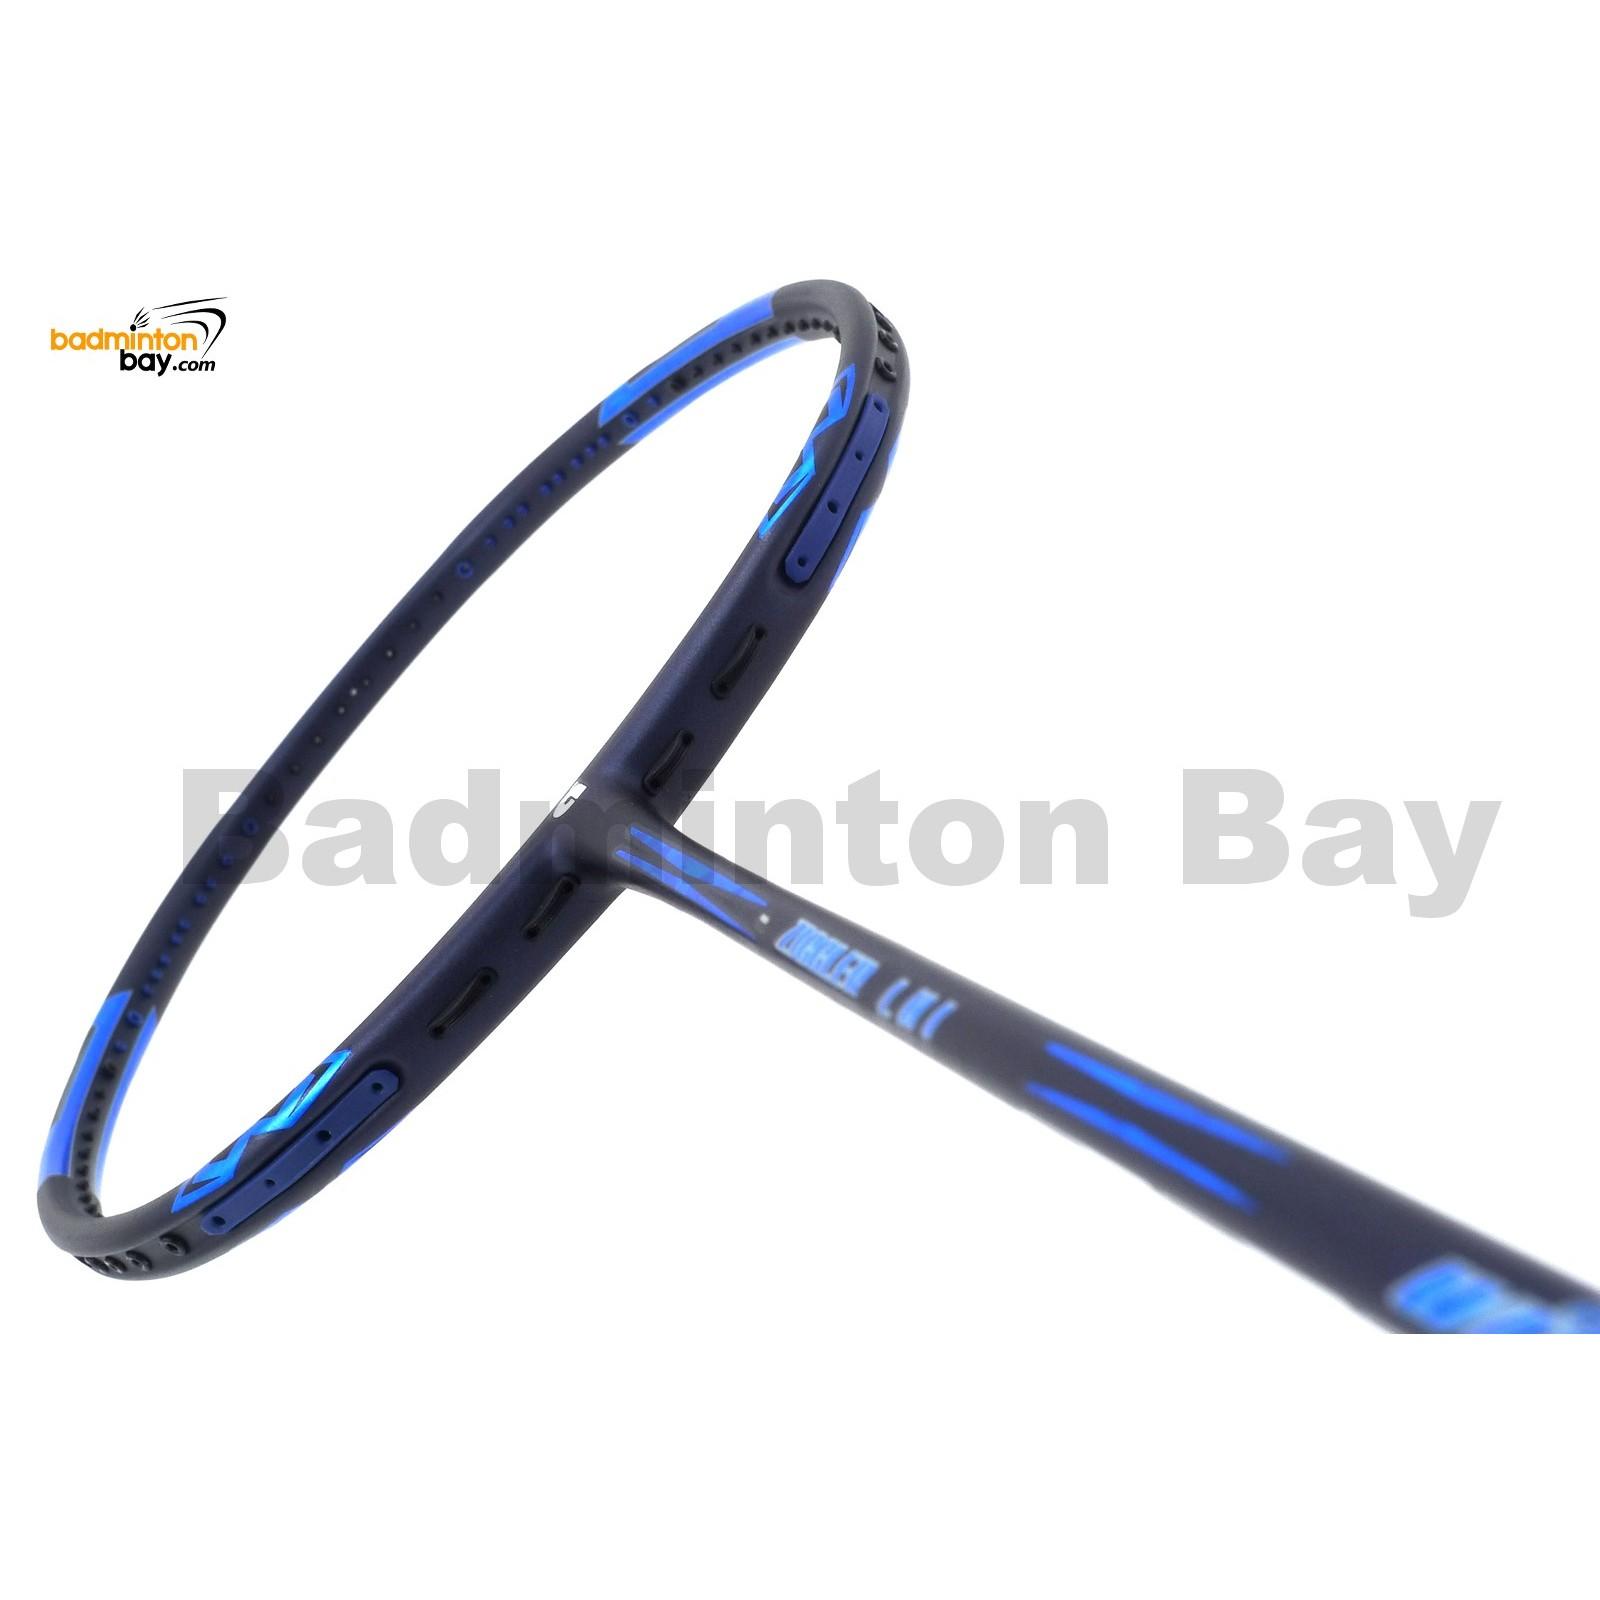 Apacs Ziggler LHI Lee Hyun il Blue Badminton Racket pact